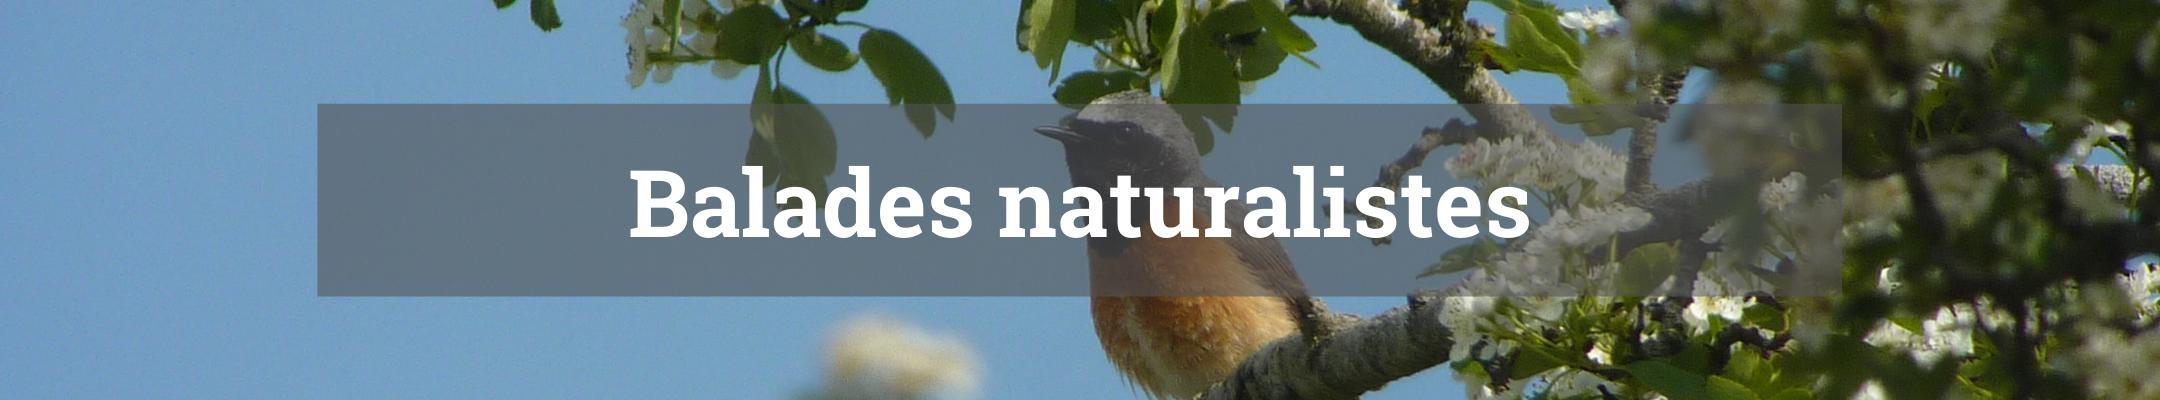 balades naturalistes titre